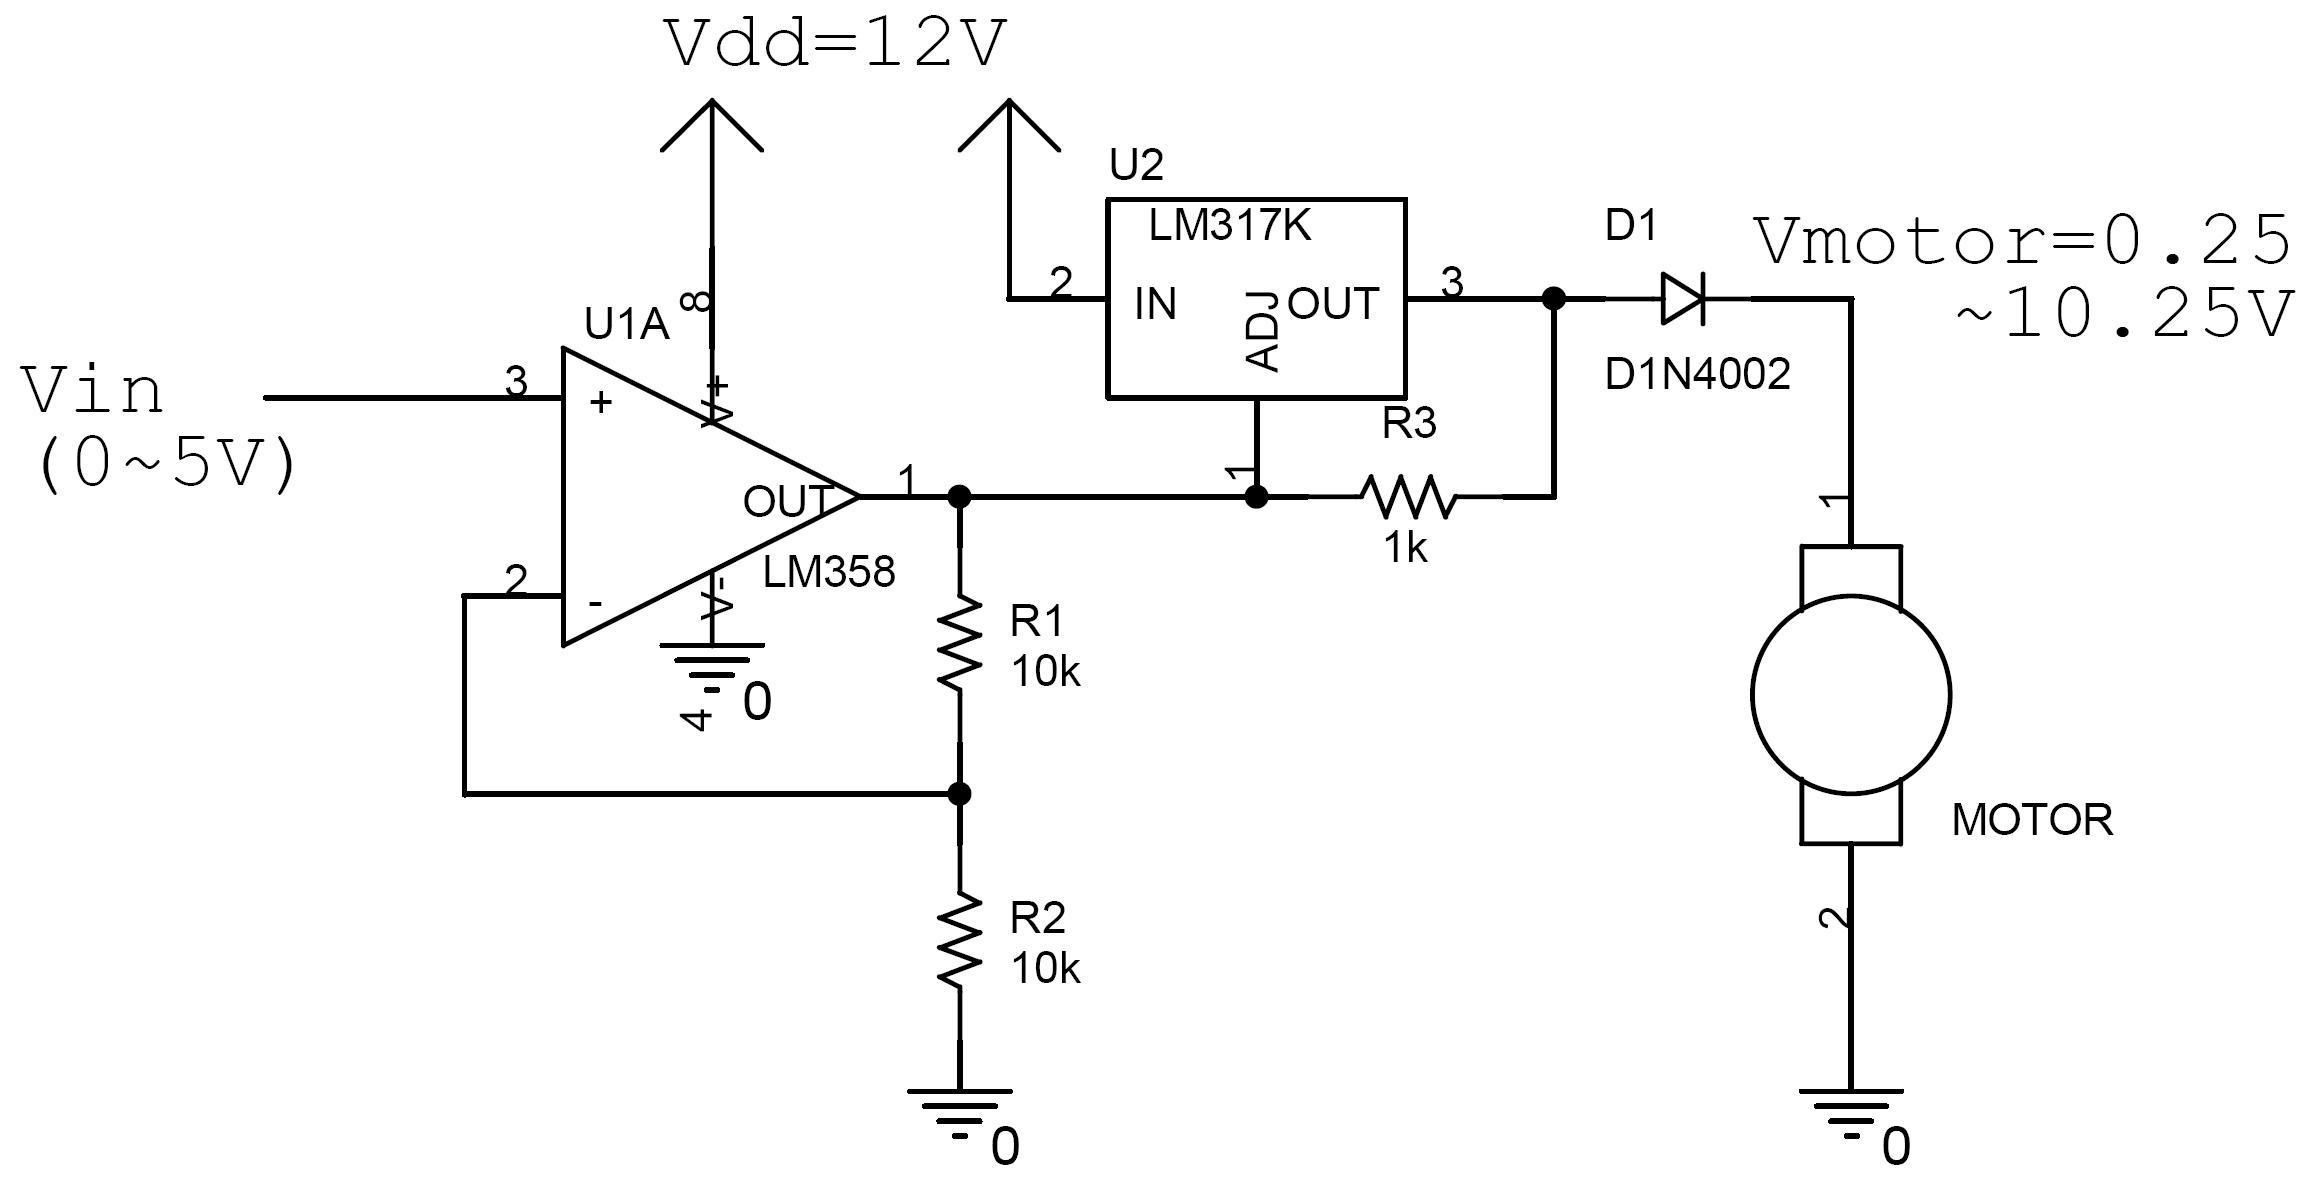 speed controller schematic lm317 lm358 [ 2313 x 1195 Pixel ]